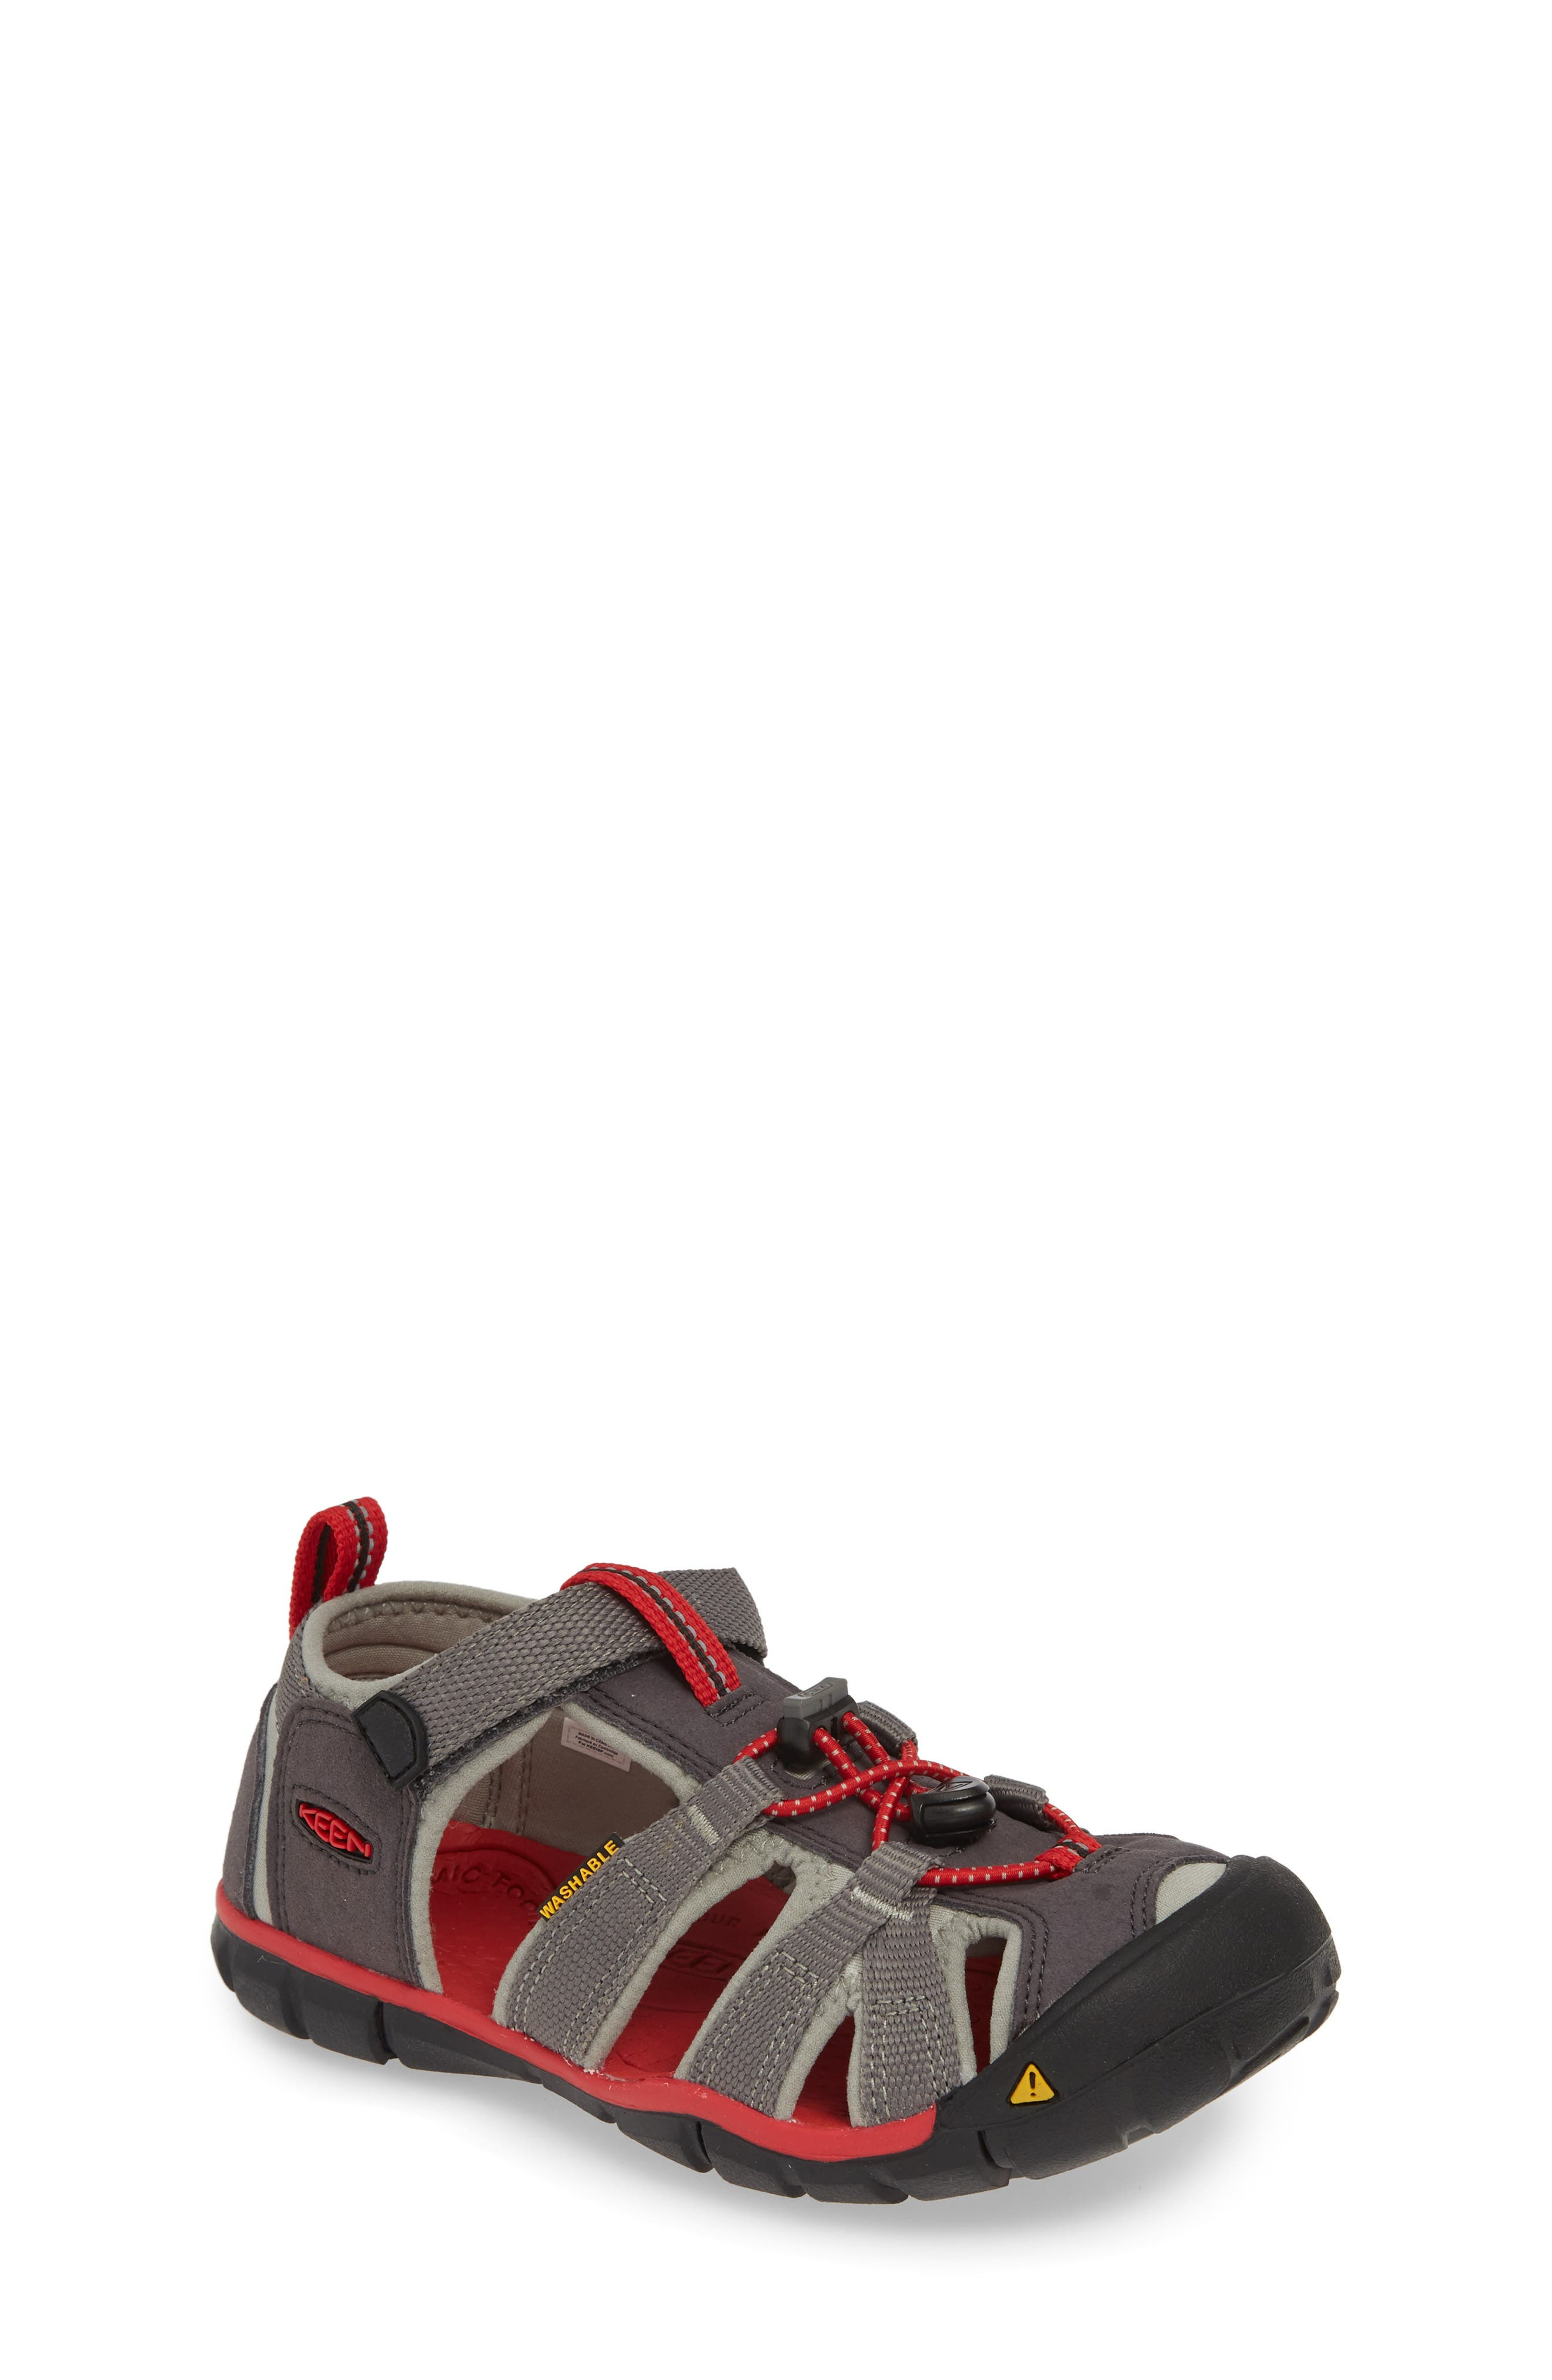 Toddler Keen Seacamp Ii Water Friendly Sandal Size 1 M  Grey